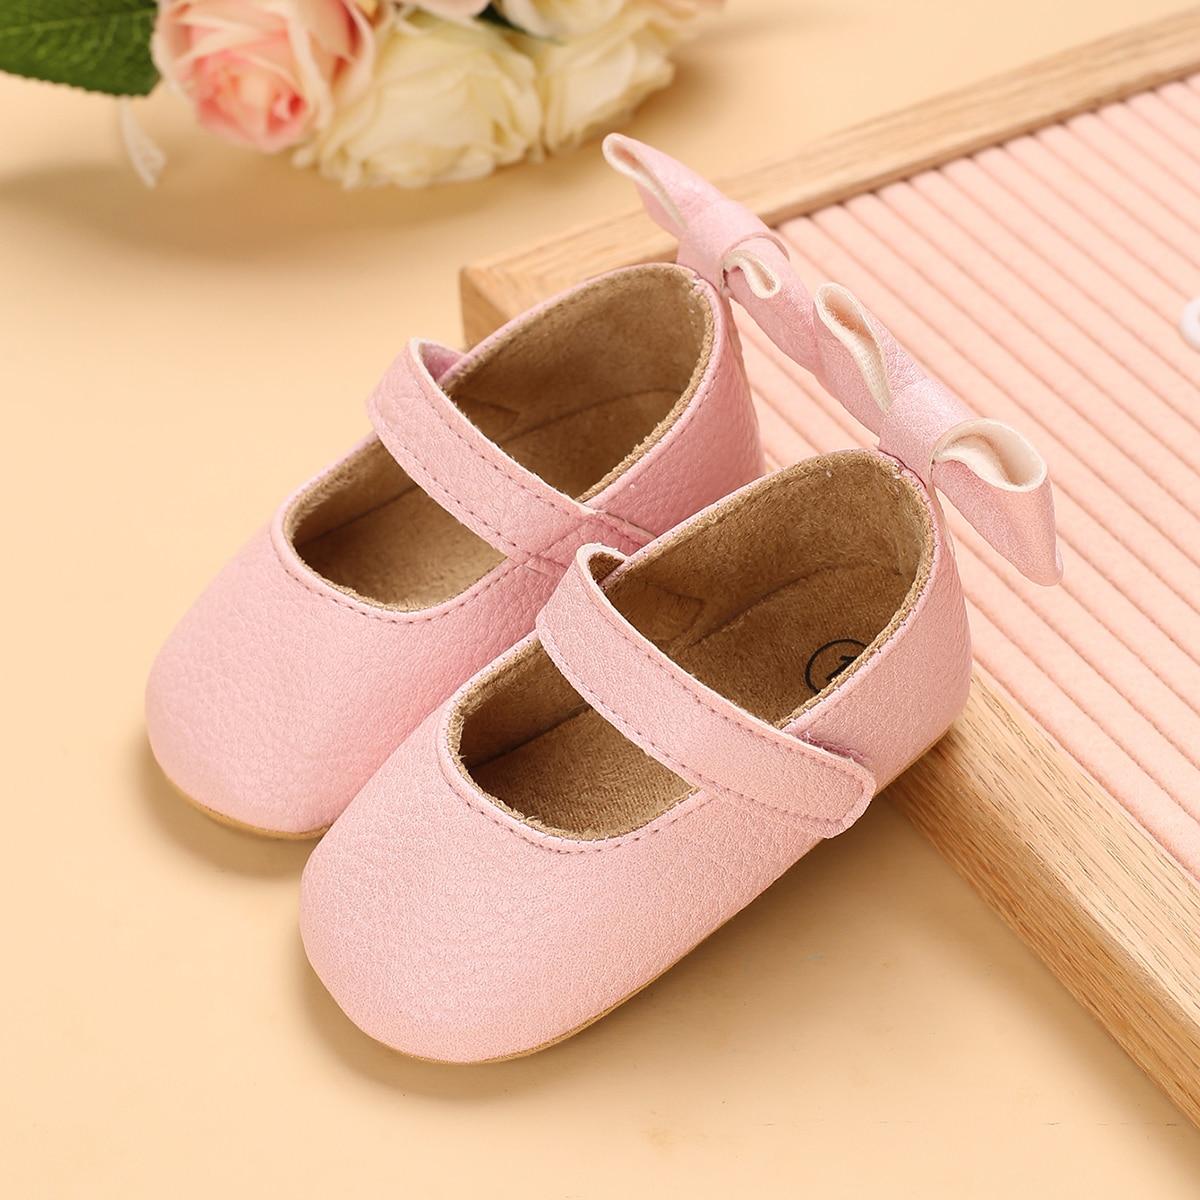 Zapatos planos para bebé Lazo Liso mary Jane